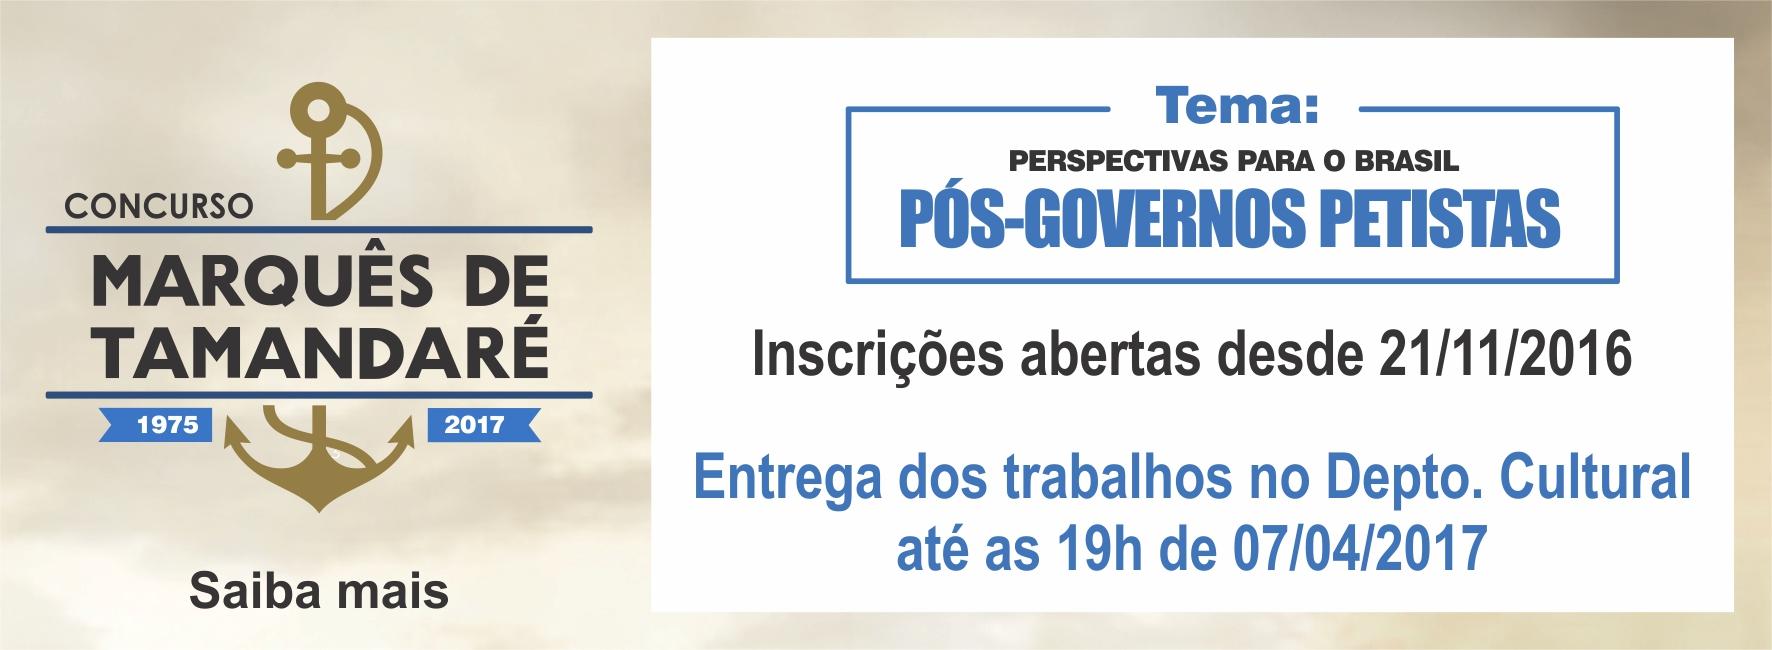 https://www.clubenaval.org.br/novo/concurso-marqu%C3%AAs-de-tamandar%C3%A9-2017-1